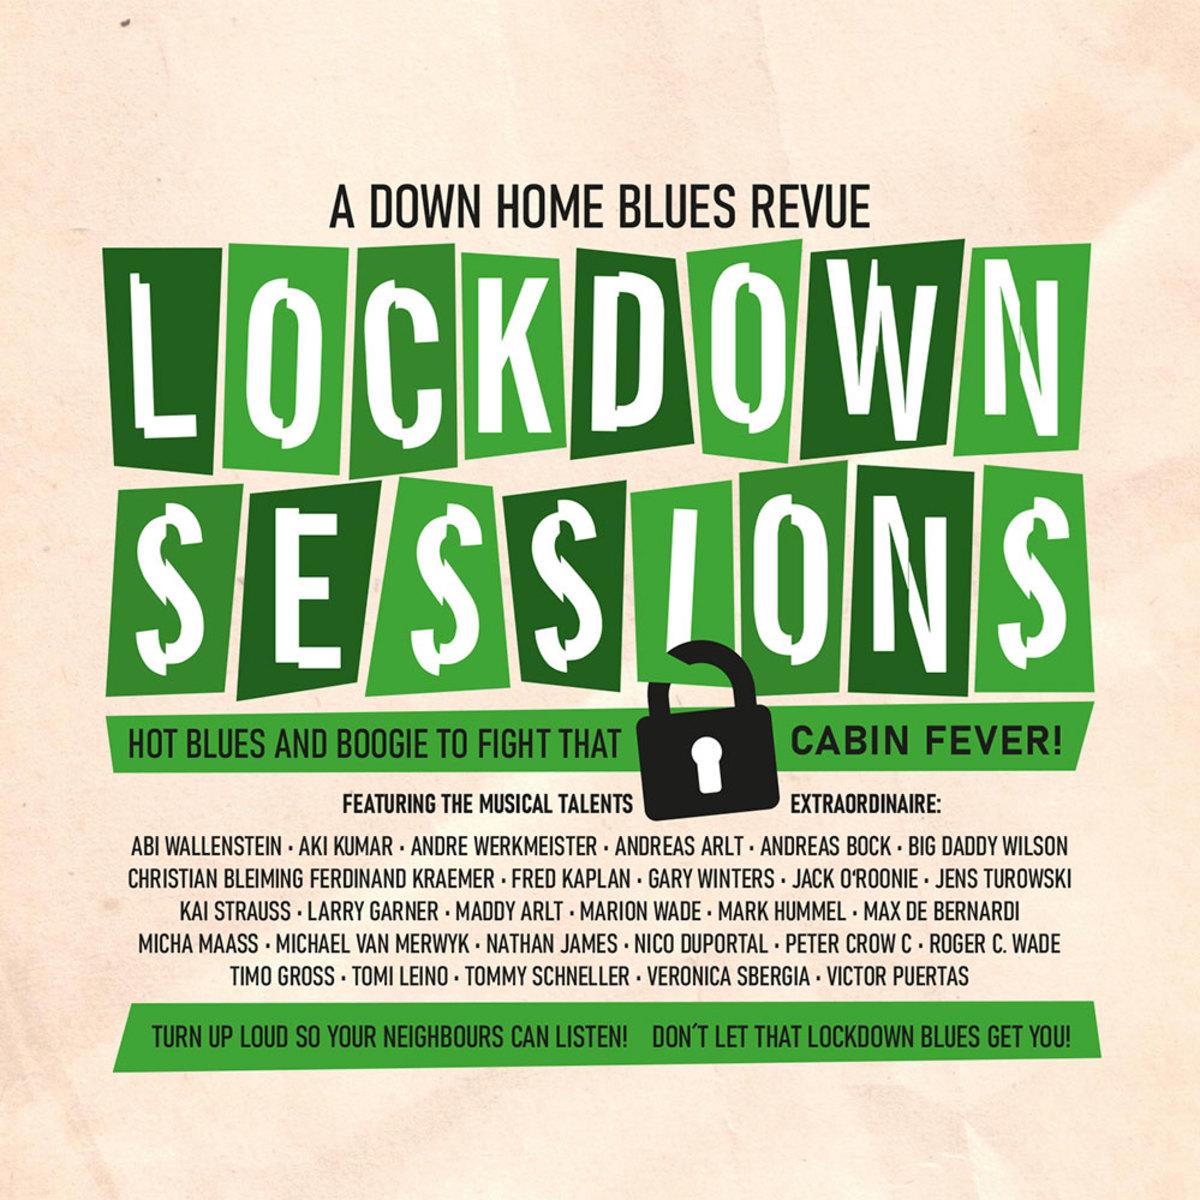 lockdown_sessions